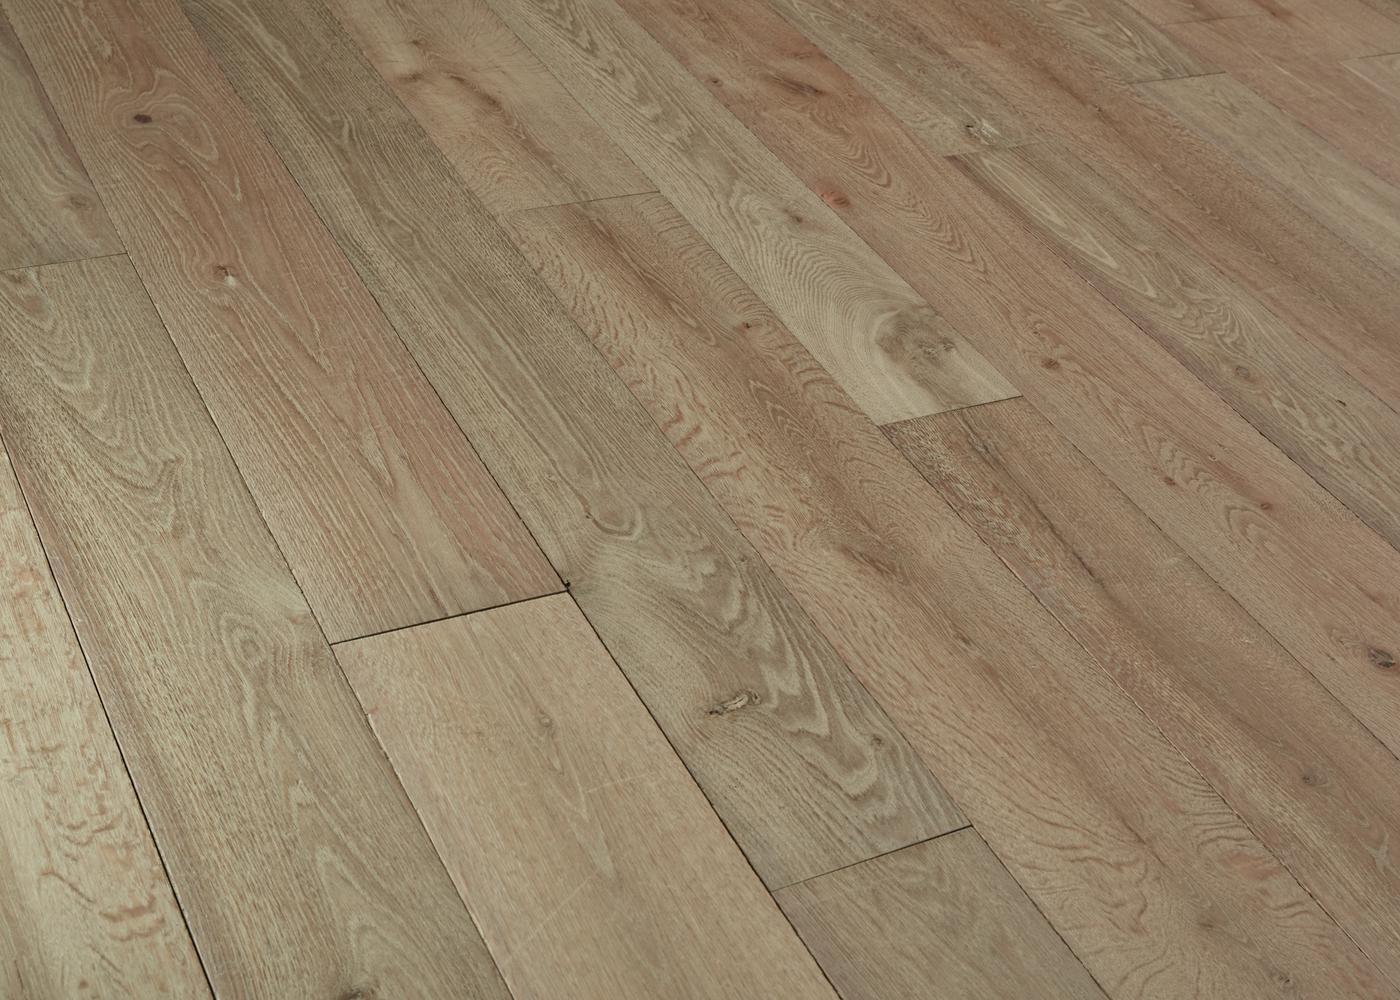 lot 62 parquet ch ne contrecoll vieilli brun clair huile aqua 60 84 m2 ep 15mm la. Black Bedroom Furniture Sets. Home Design Ideas